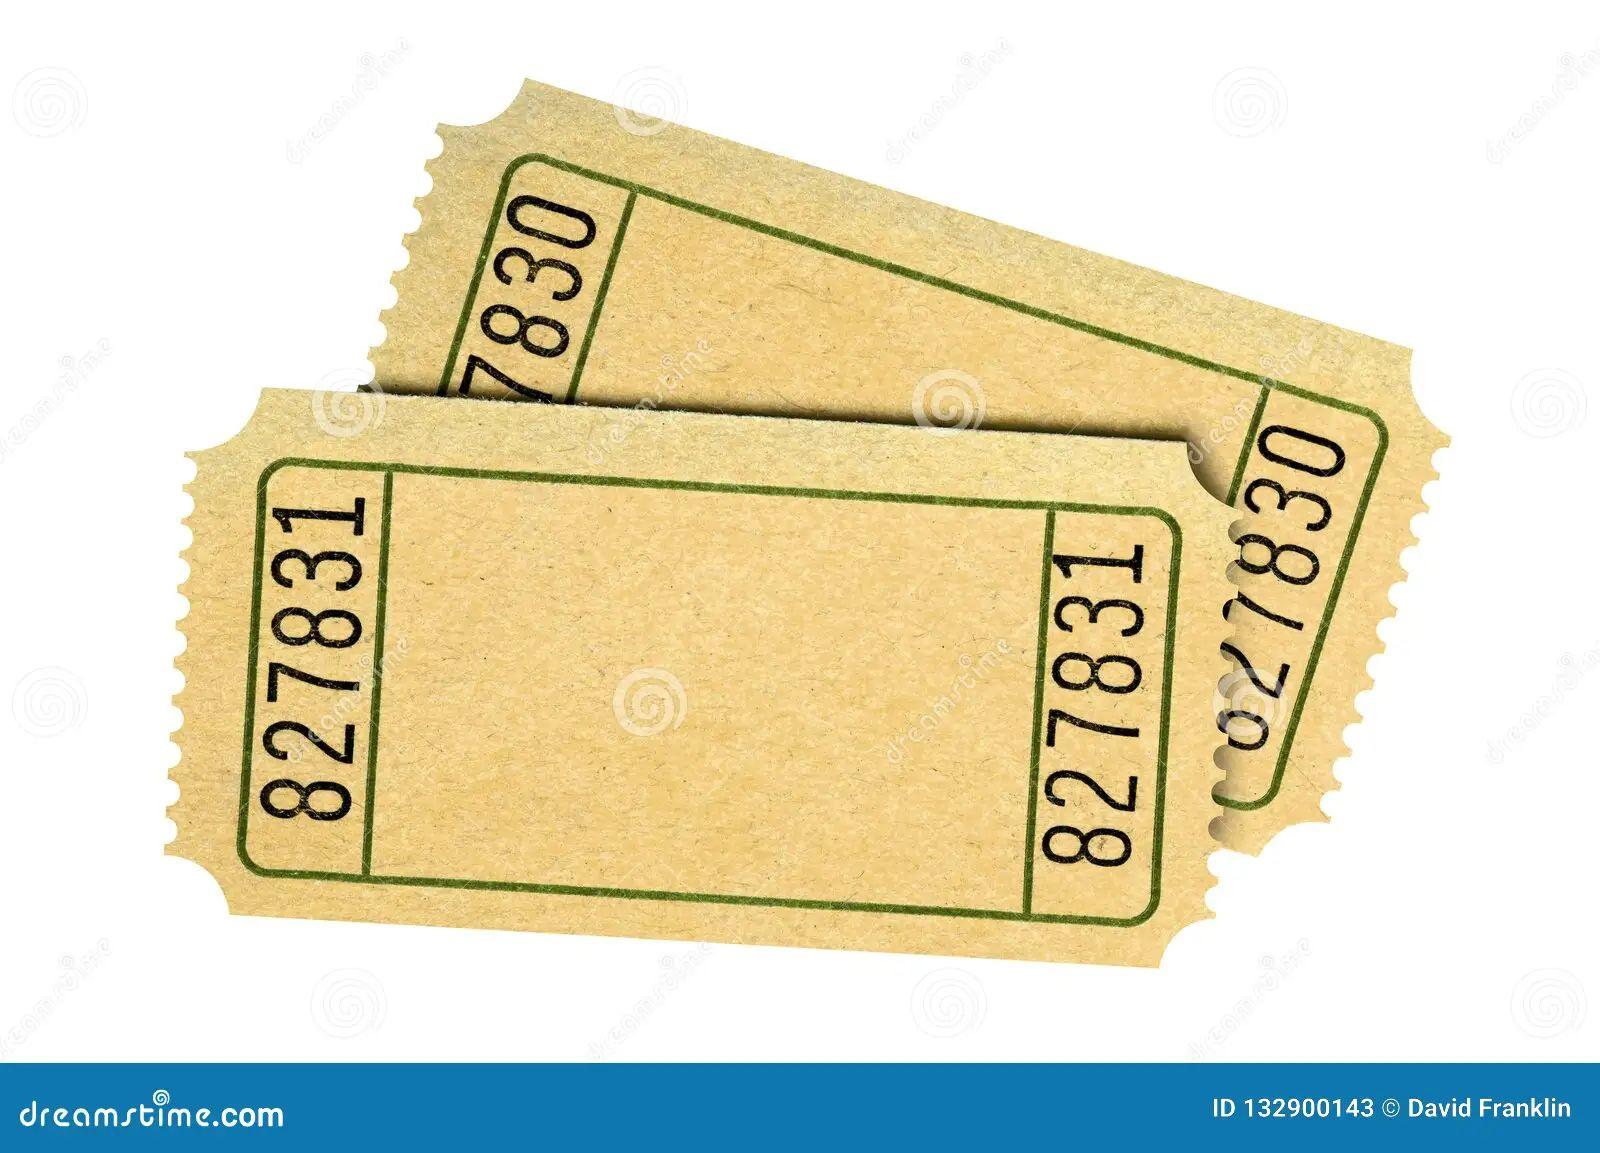 plain raffle tickets